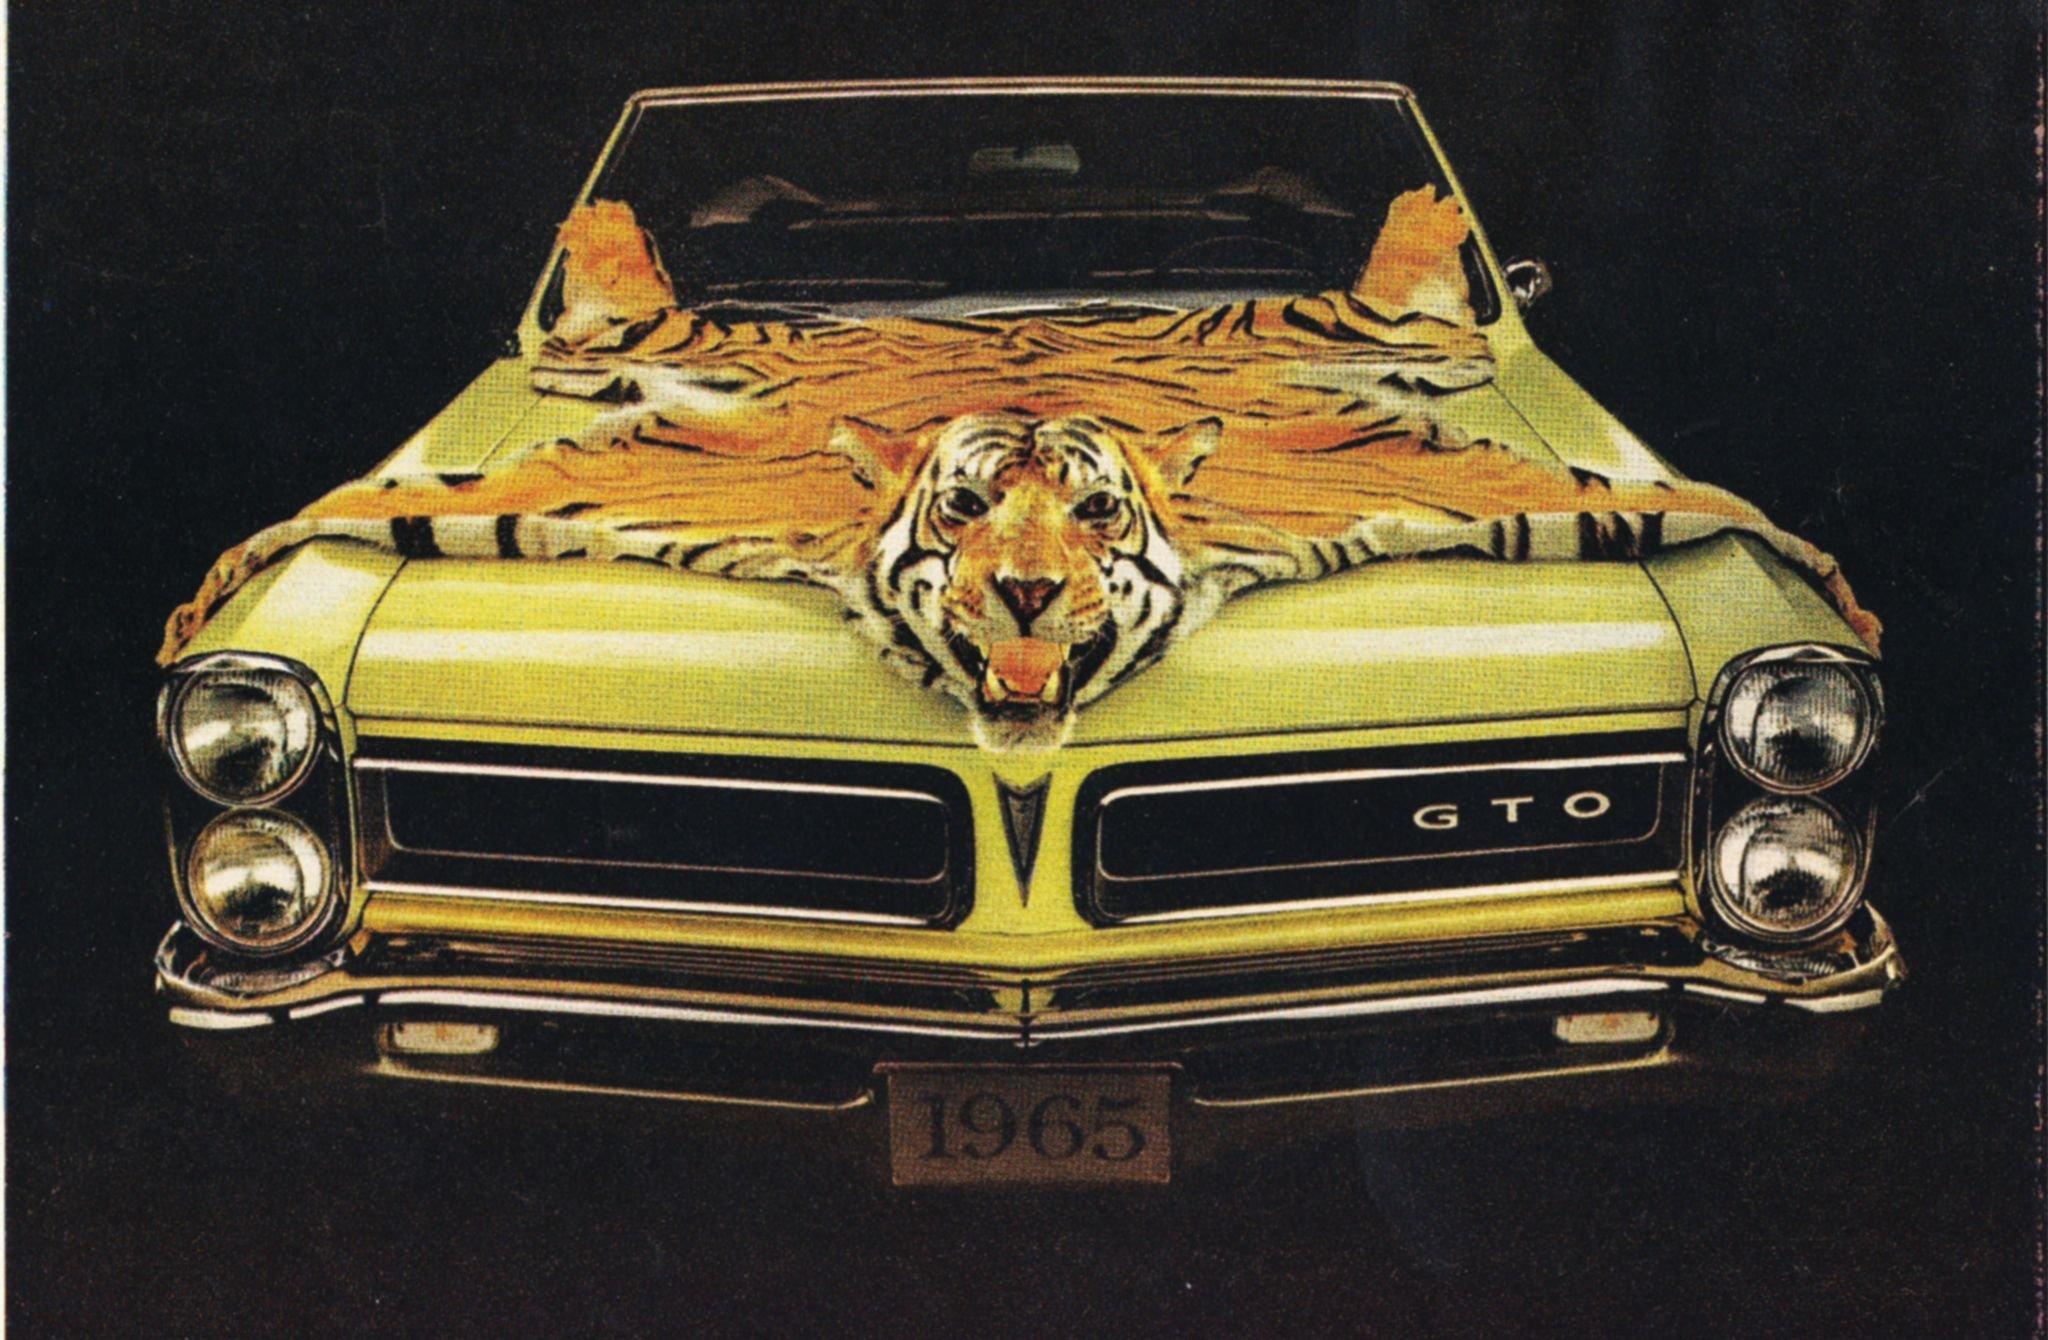 1965 Pontiac GTO Hardtop-01 wallpaper